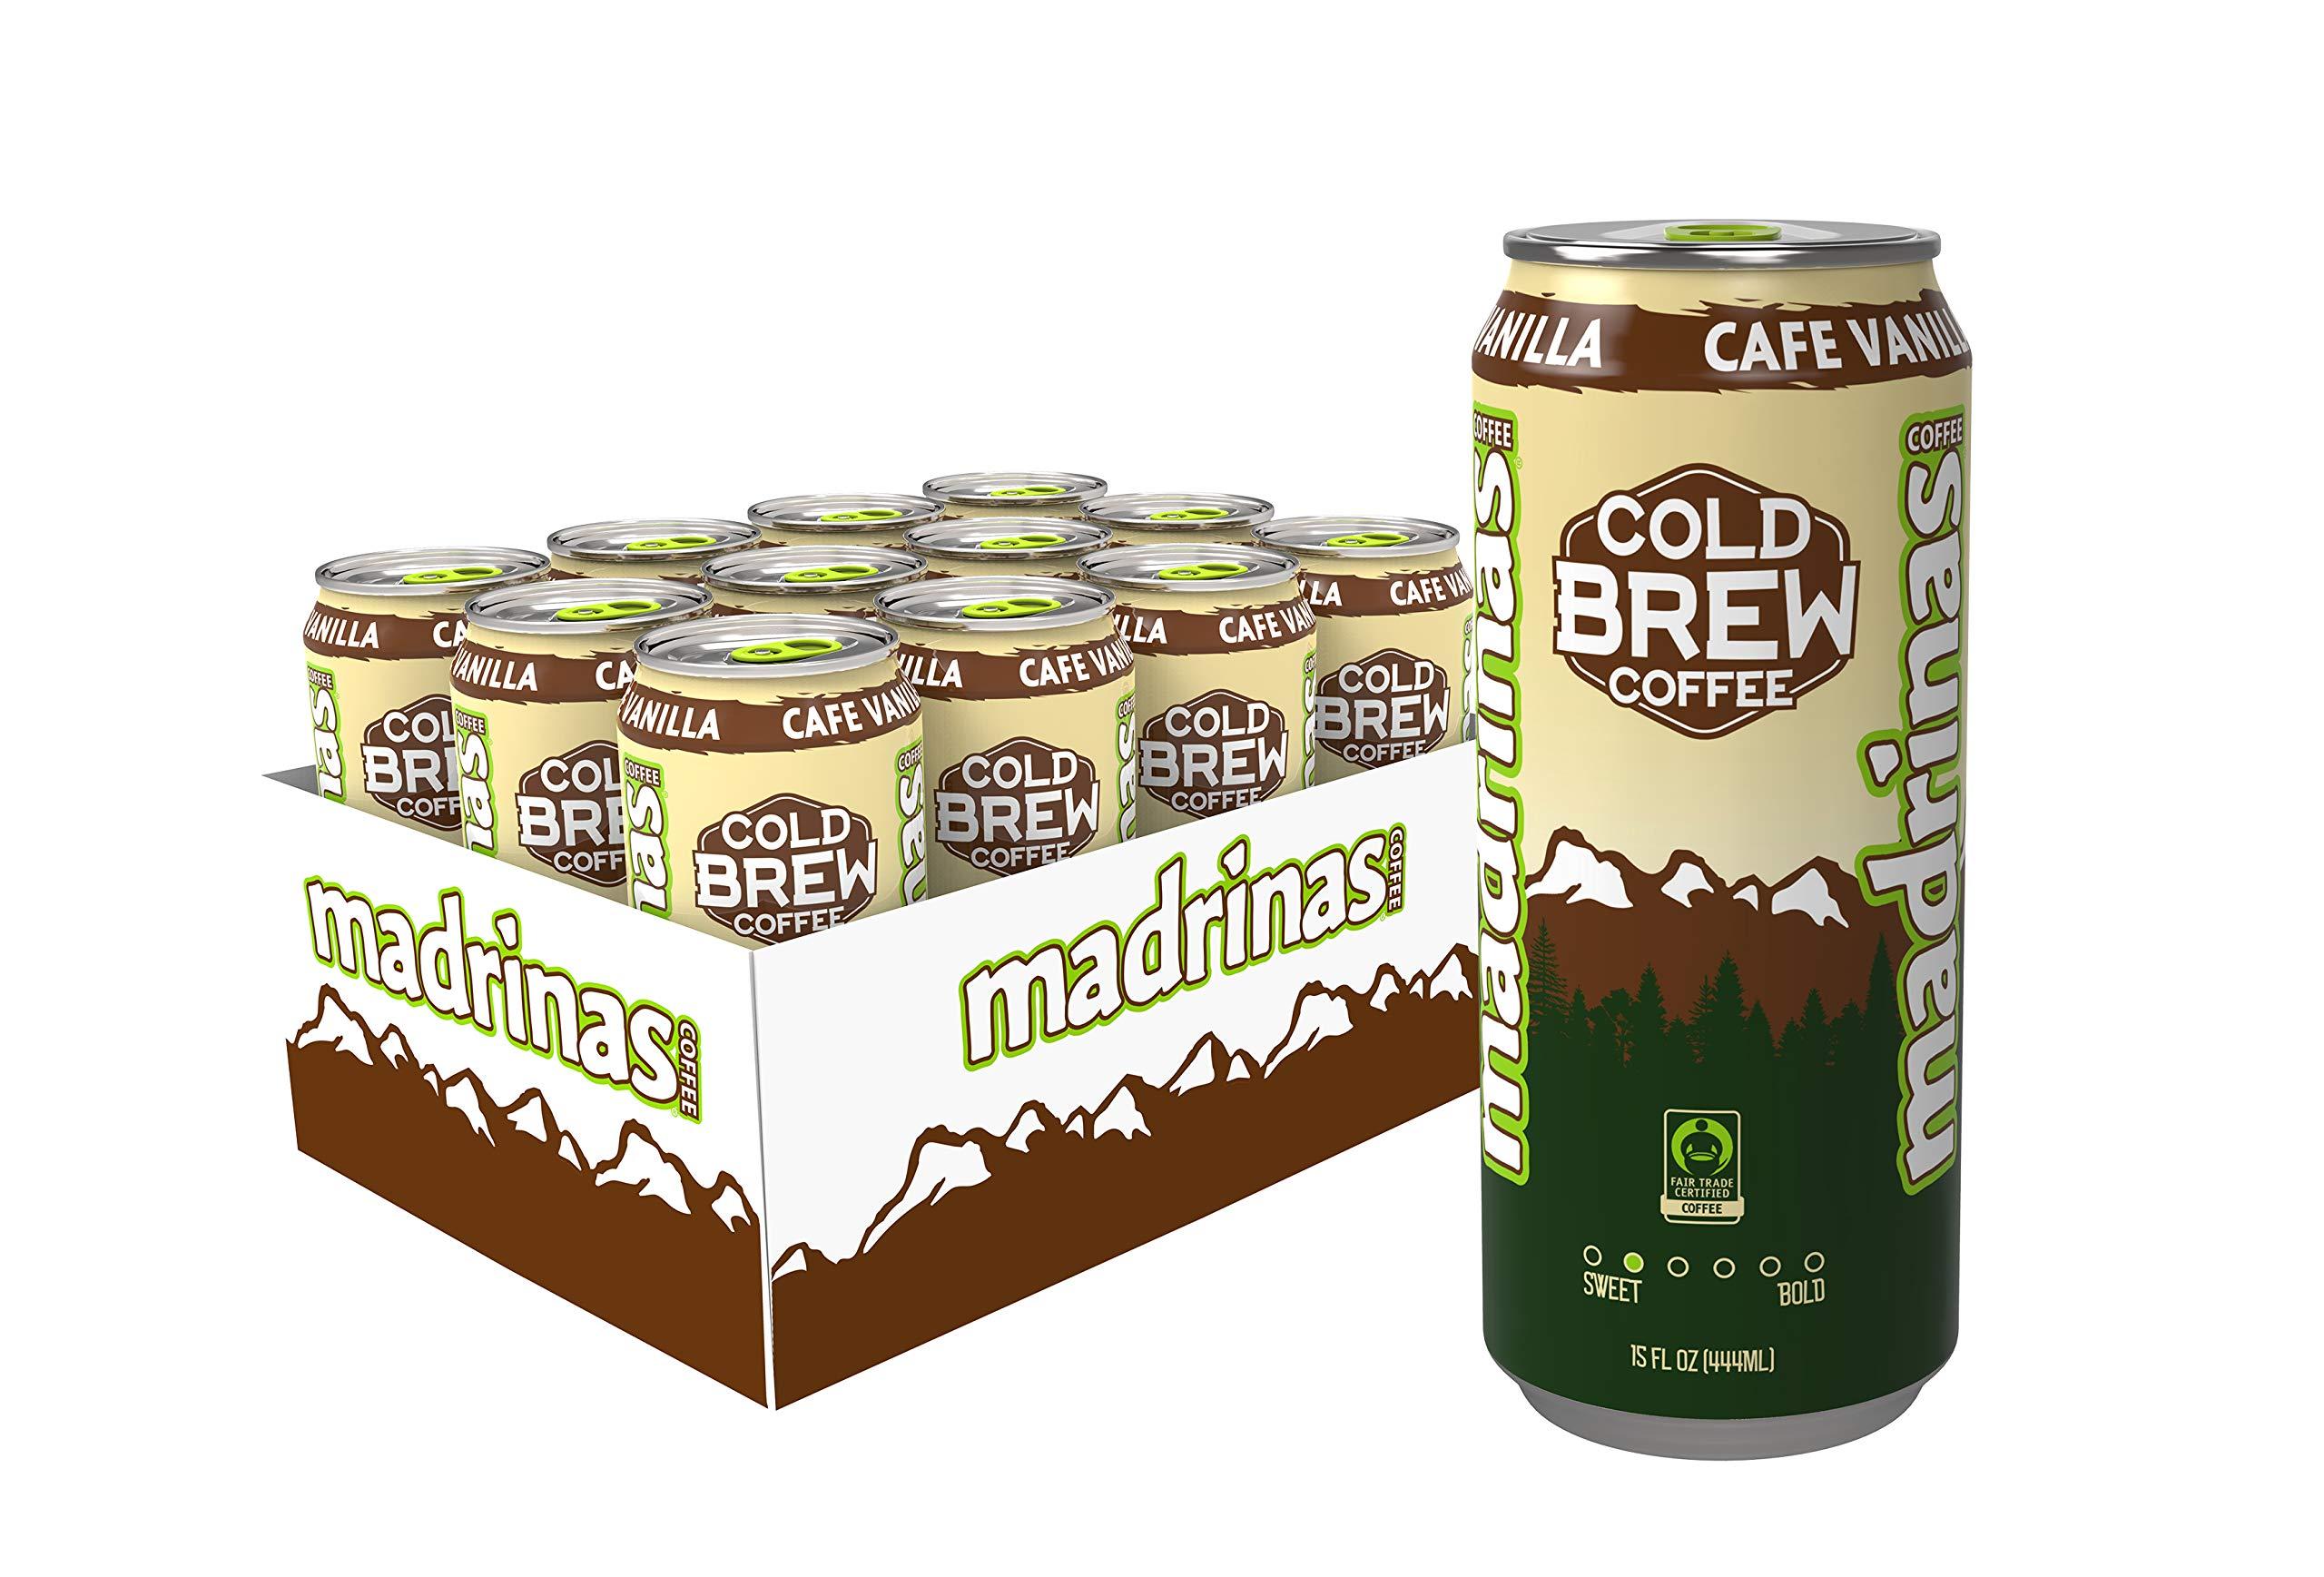 Madrinas Cafe Vanilla Fair Trade Cold Brew Coffee, 15 Fl Oz (Pack of 12) by Madrinas Coffee